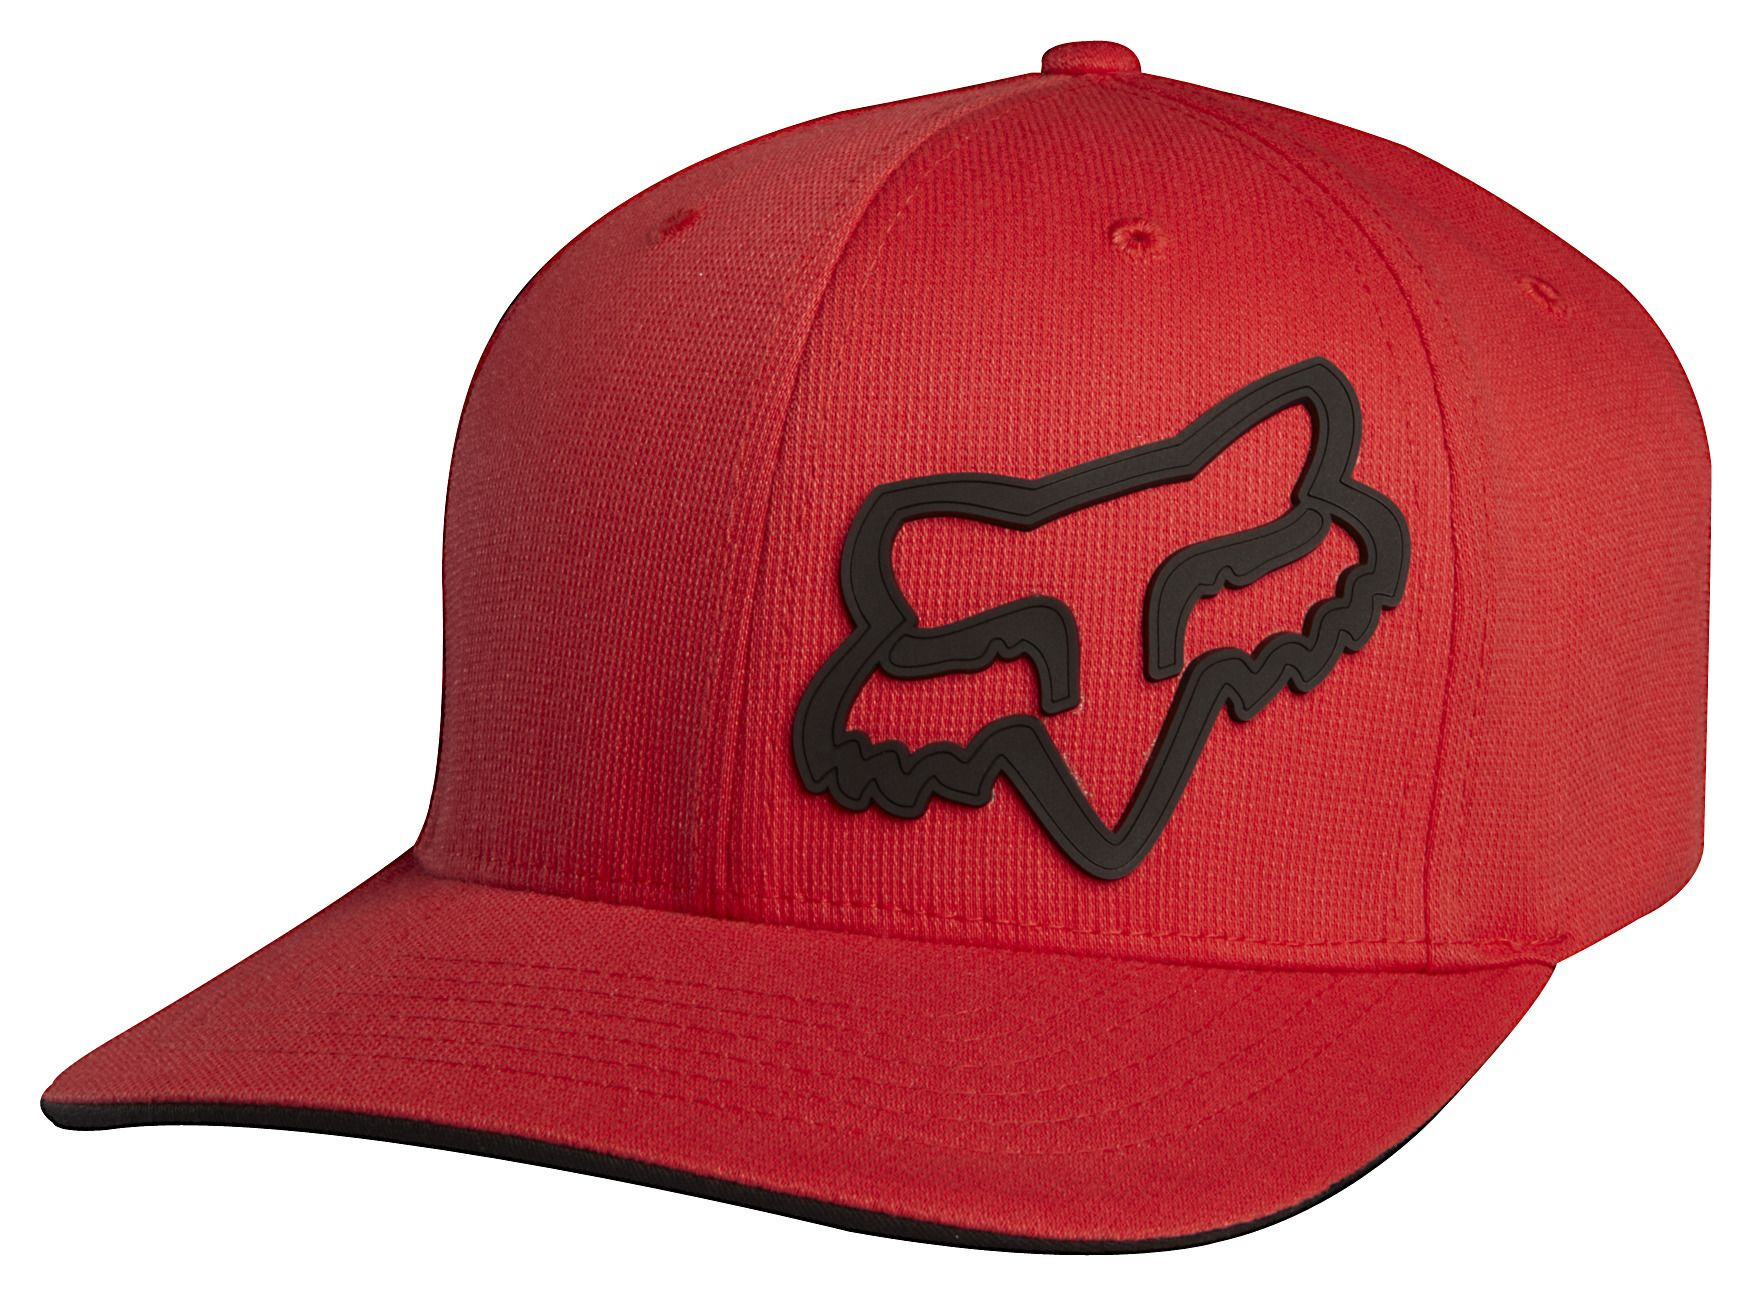 new photos 0fa94 47cd8 ... australia fox racing youth signature flexfit hat cycle gear 2d31c 3cee1